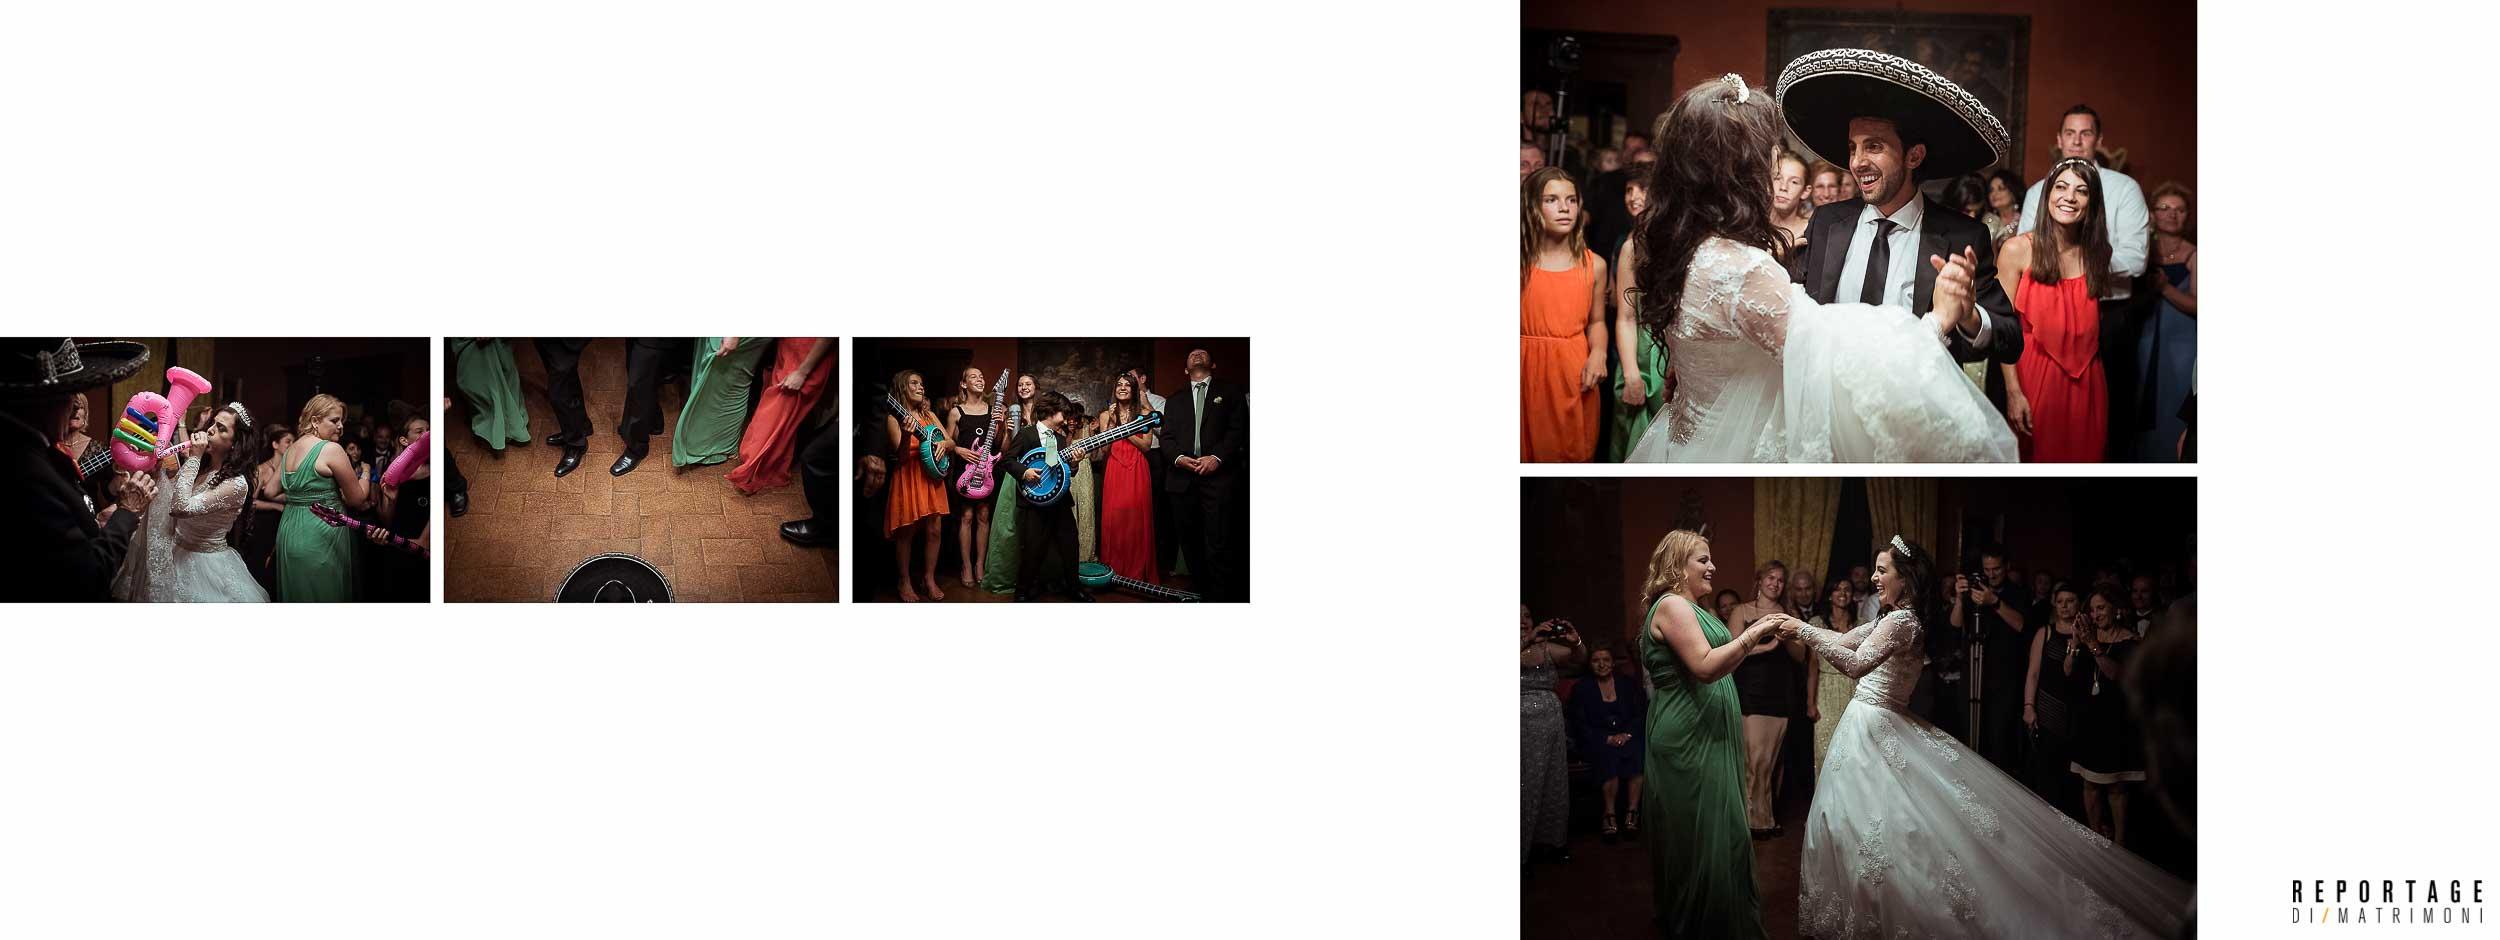 labro_wedding23